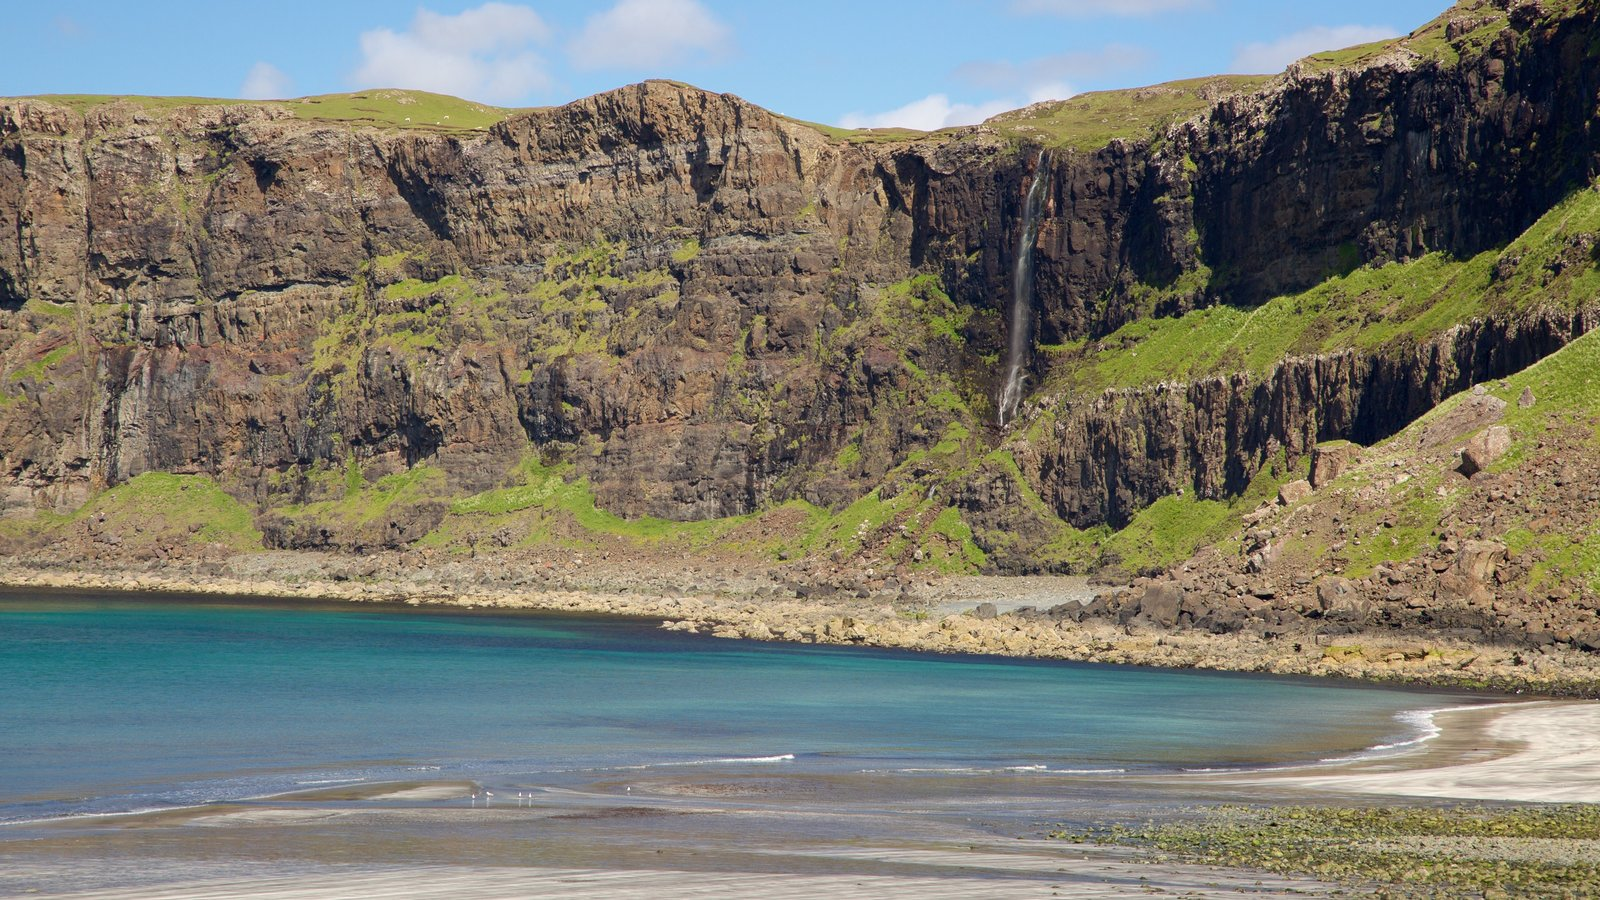 Isle of Skye showing rocky coastline and a beach